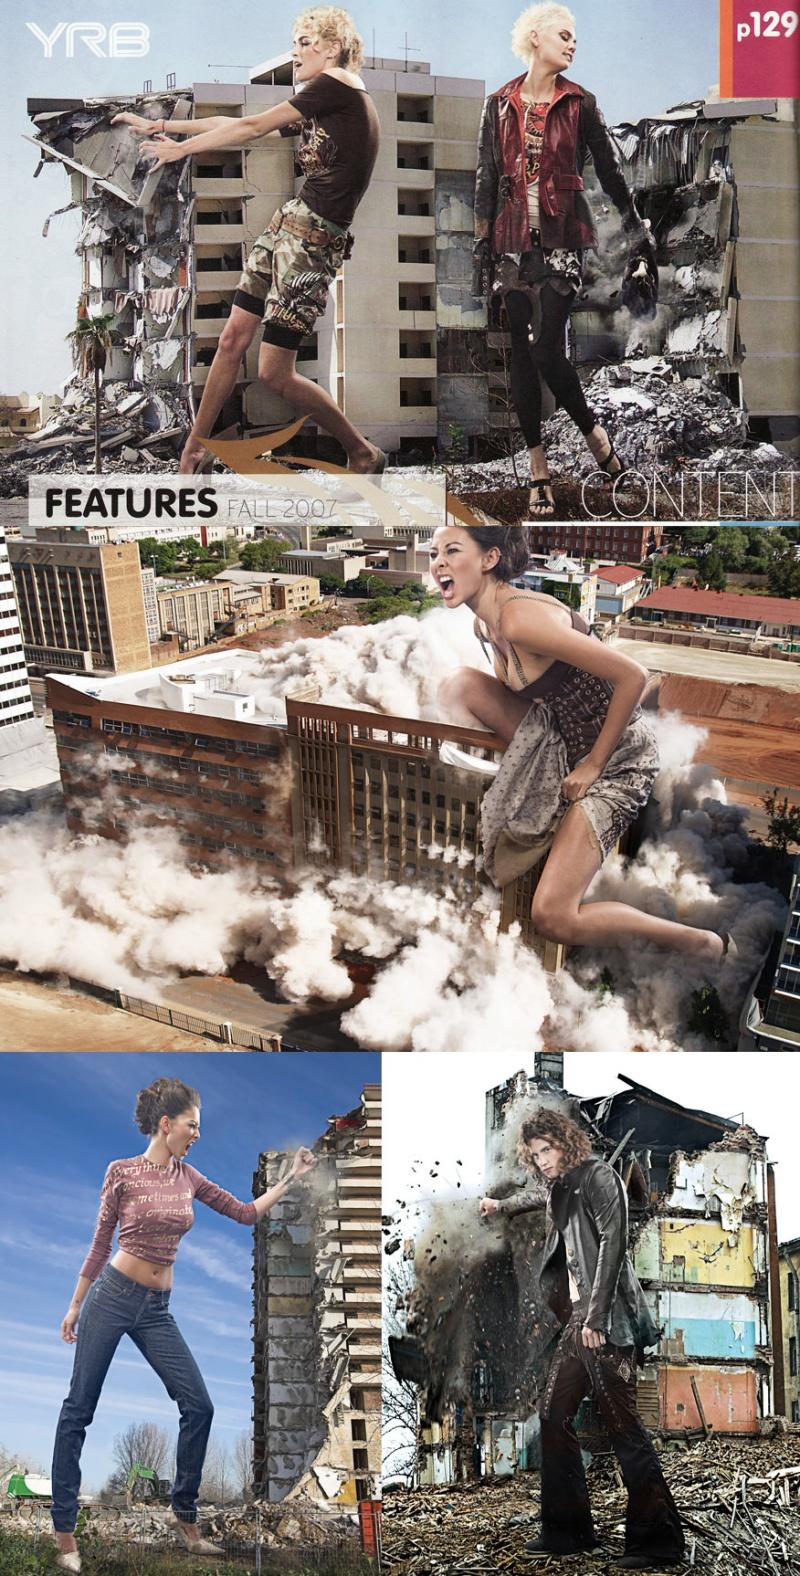 Female model photo shoot of jstmakeup by allan amato photography, clothing designed by Antiseptic Fashion